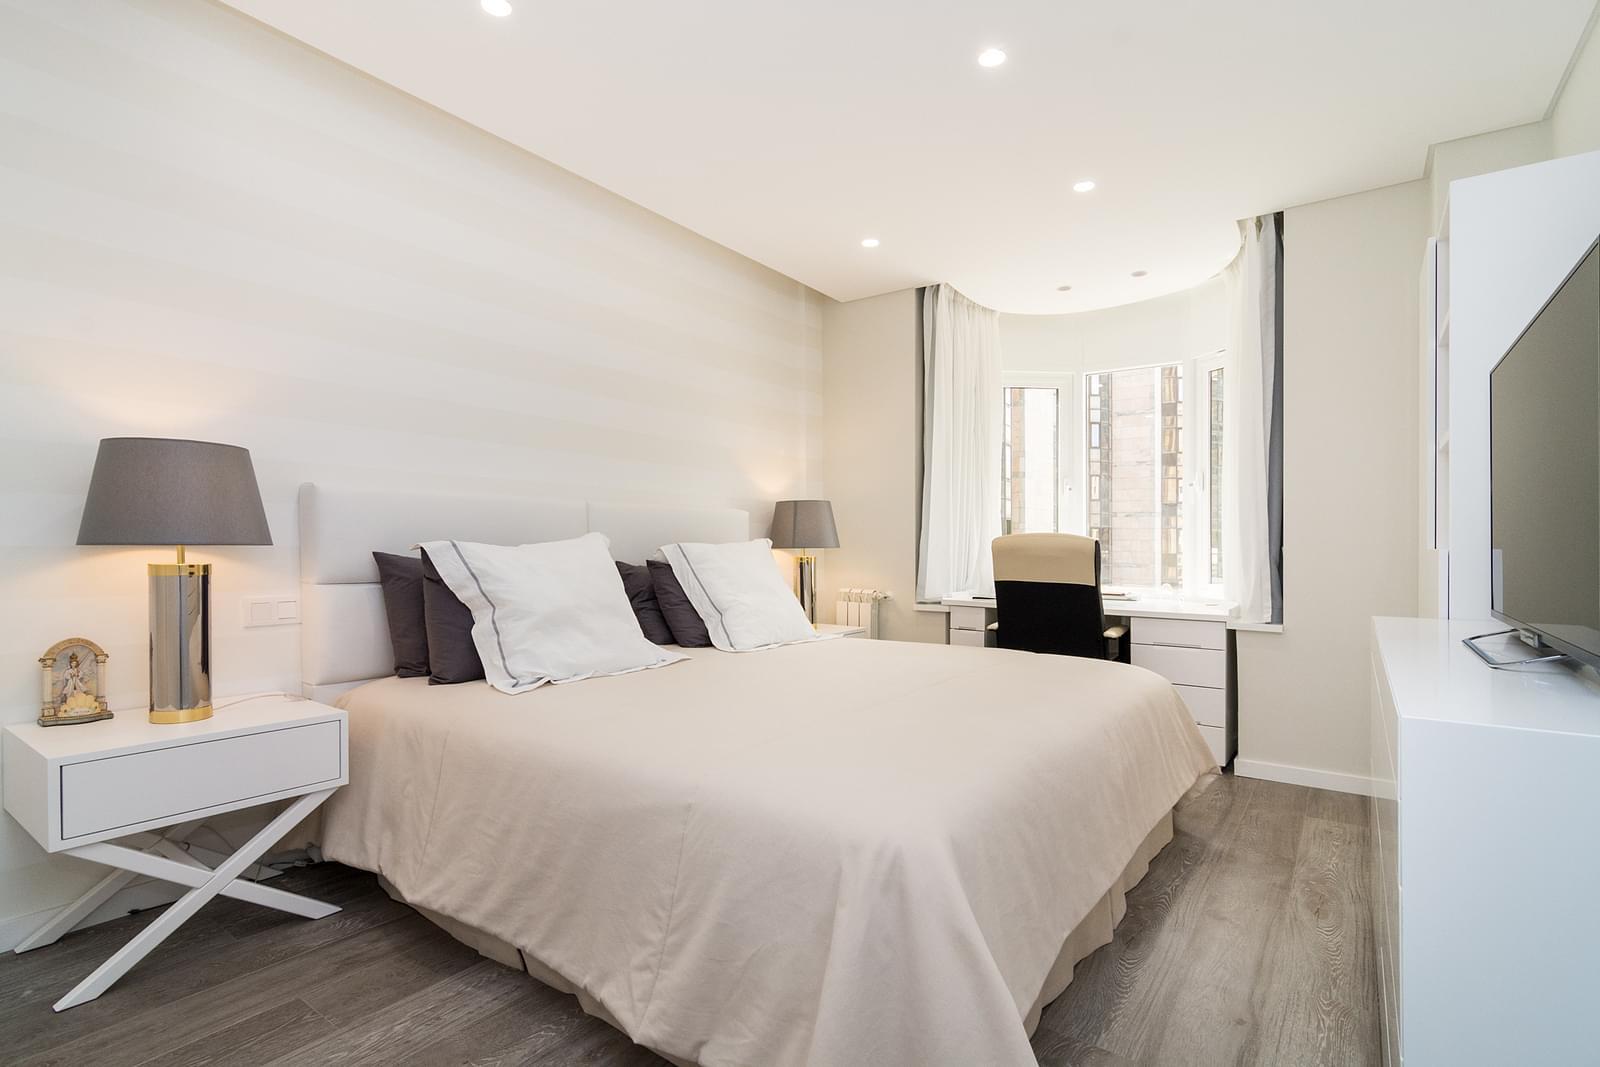 pf17479-apartamento-t4-lisboa-916ca008-154f-4929-a0e8-d30aefa309a3